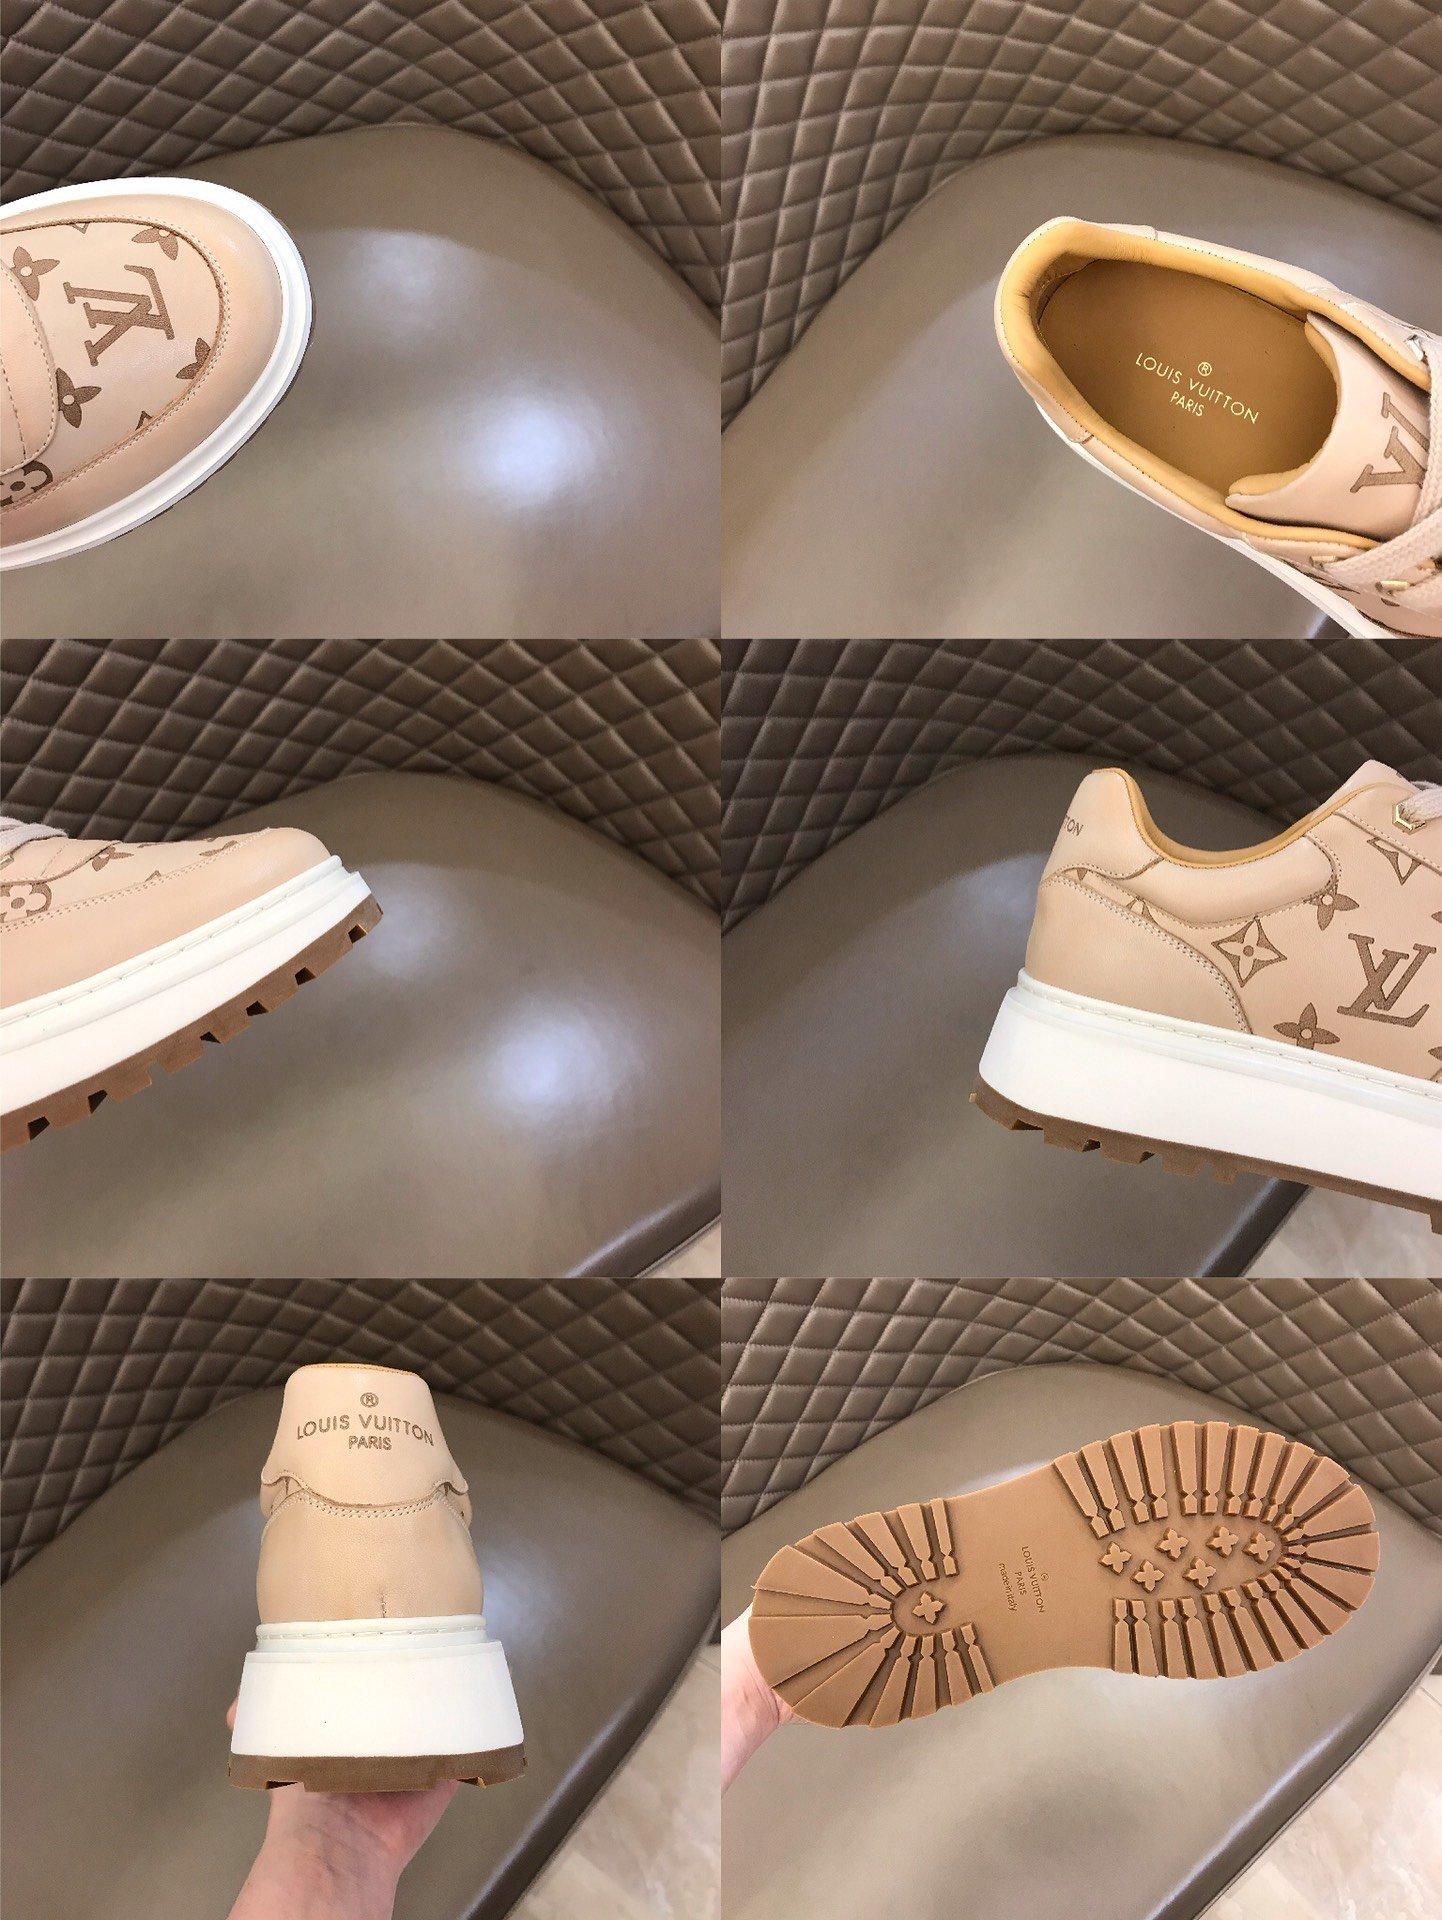 LVL奢品男士Abbesses运动鞋